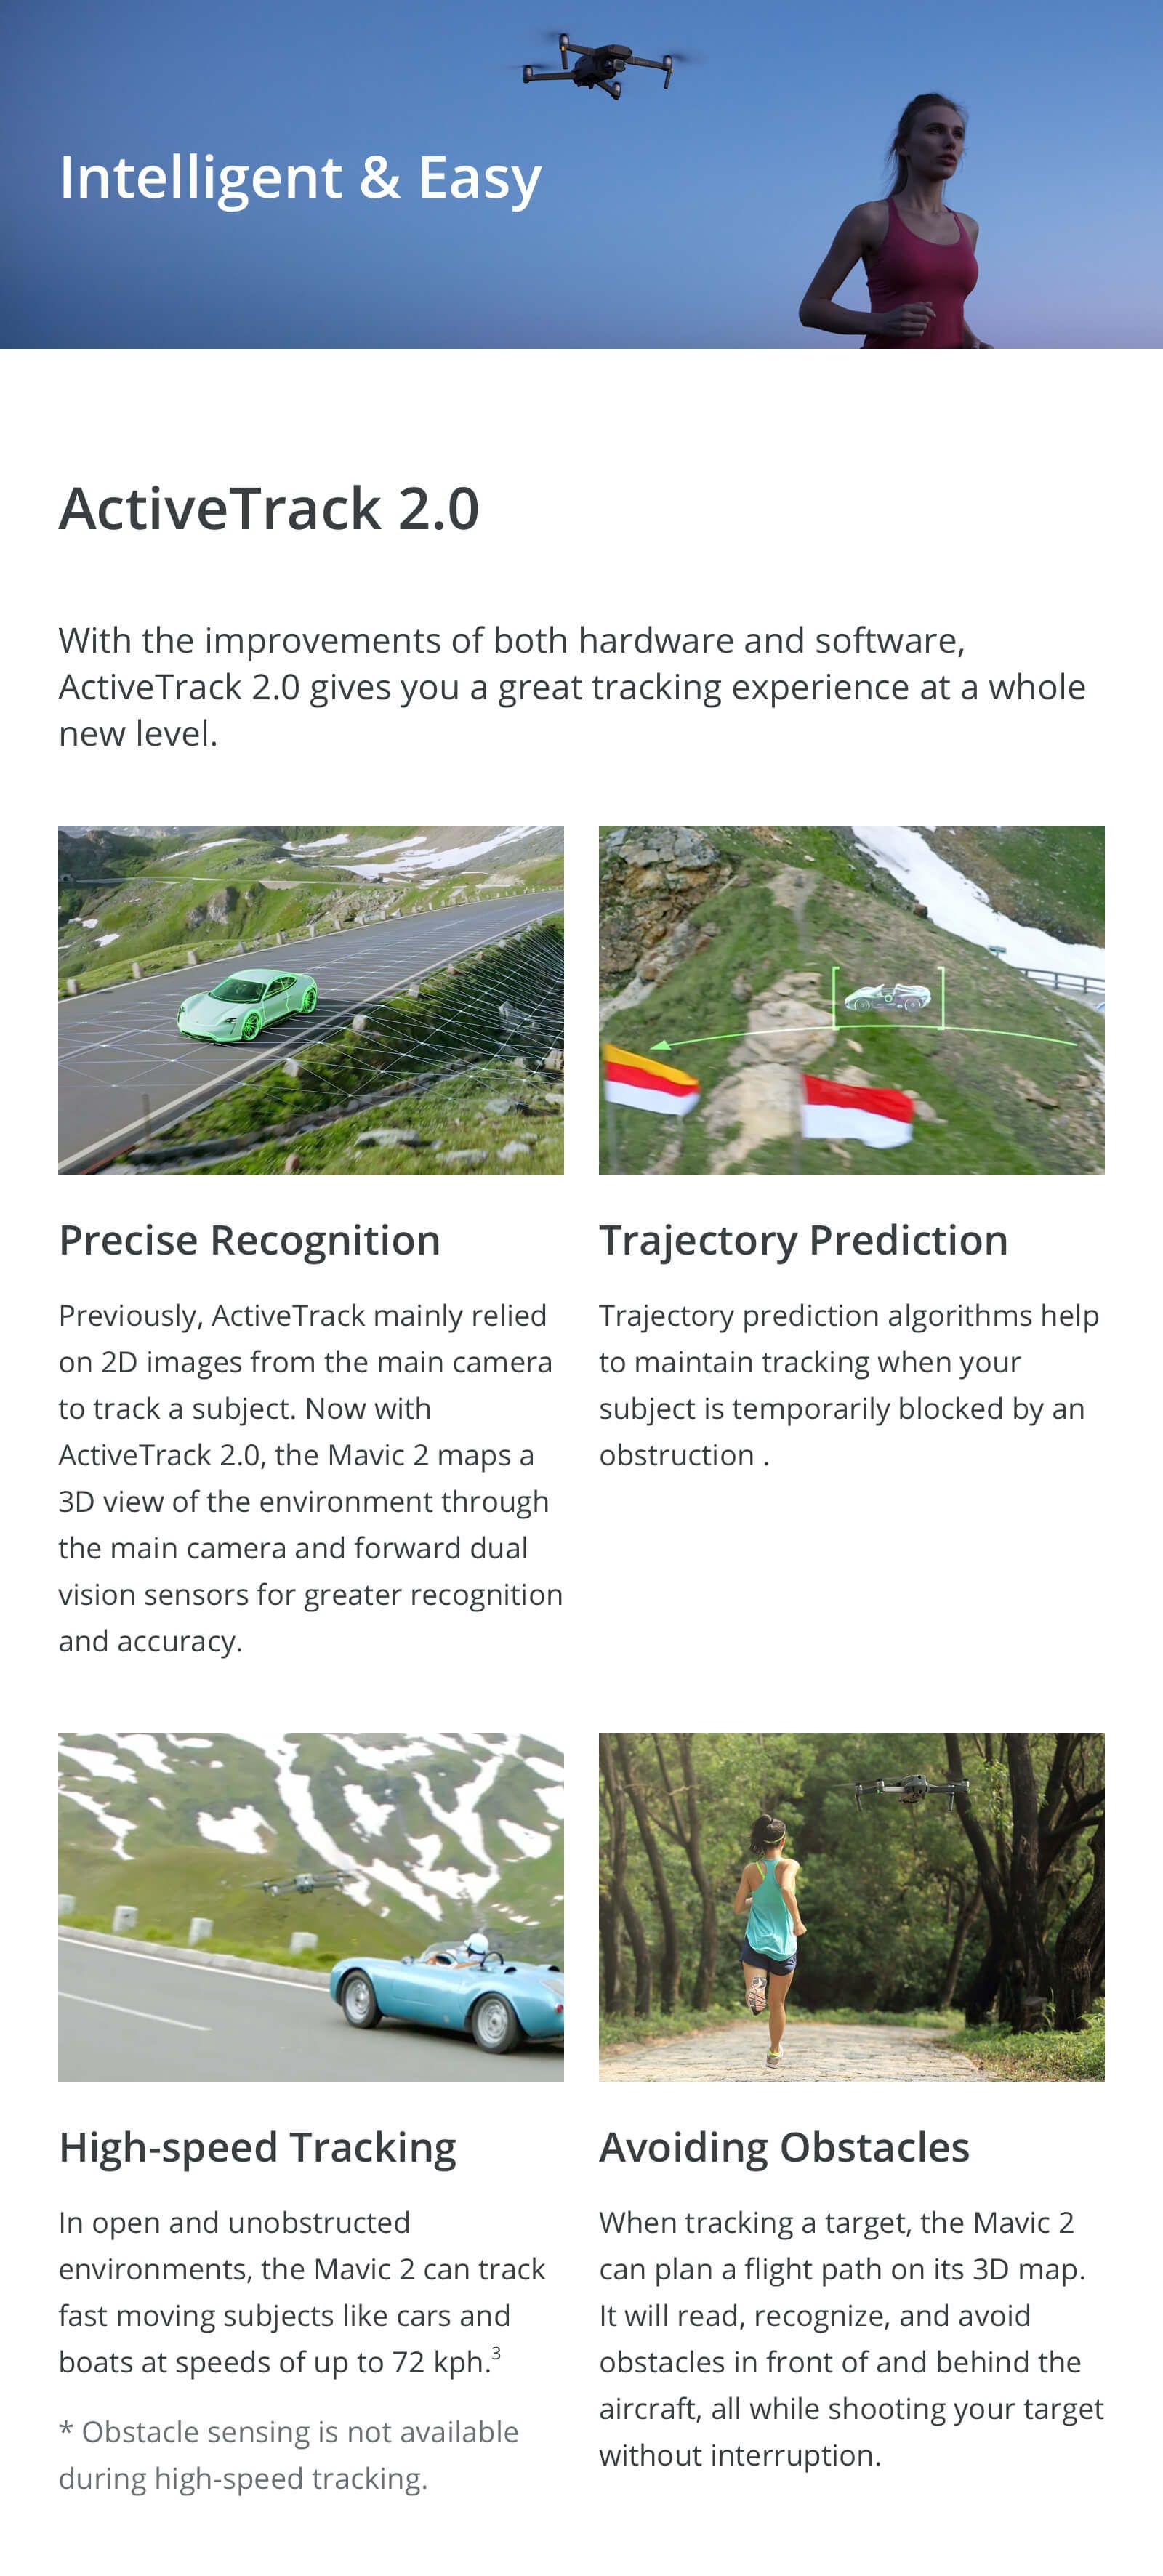 b5c8e429e9b Pin by Anton van Niekerk on DJI Mavic 2 Pro | Mavic, Rc drone, Dji ...